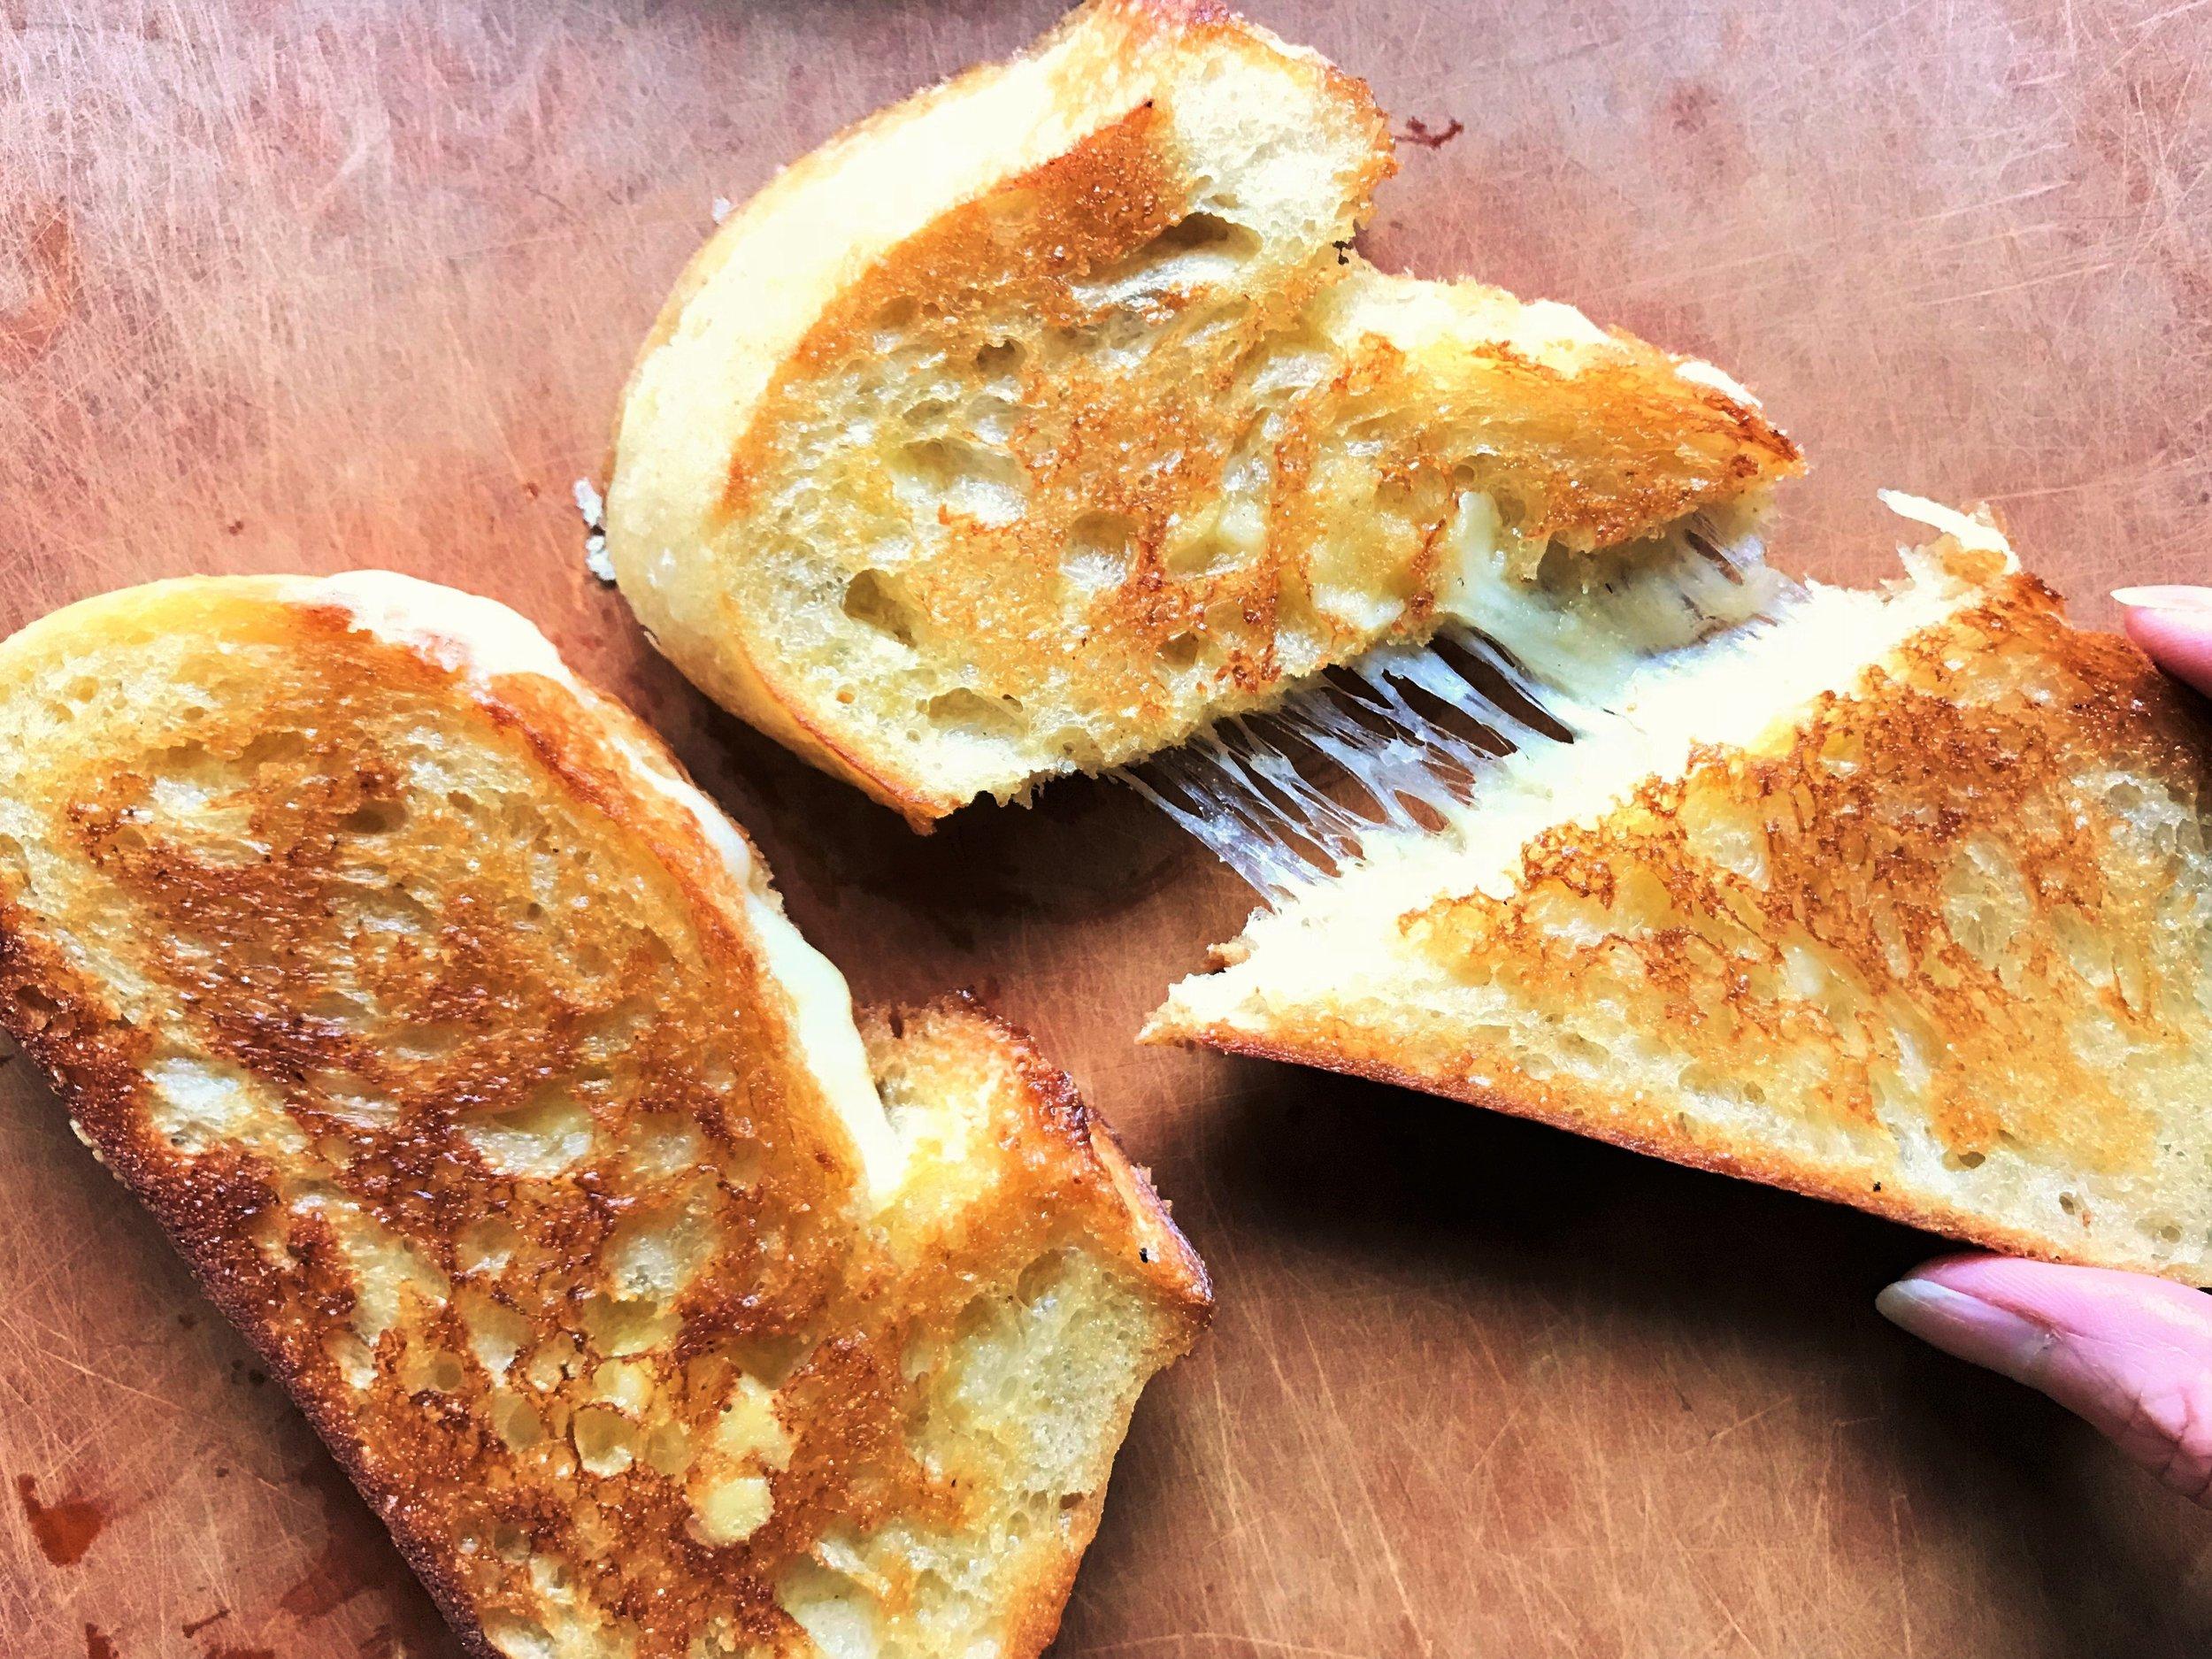 Gruyere Grilled Cheese sandwich made in the Adventure Kitchen.